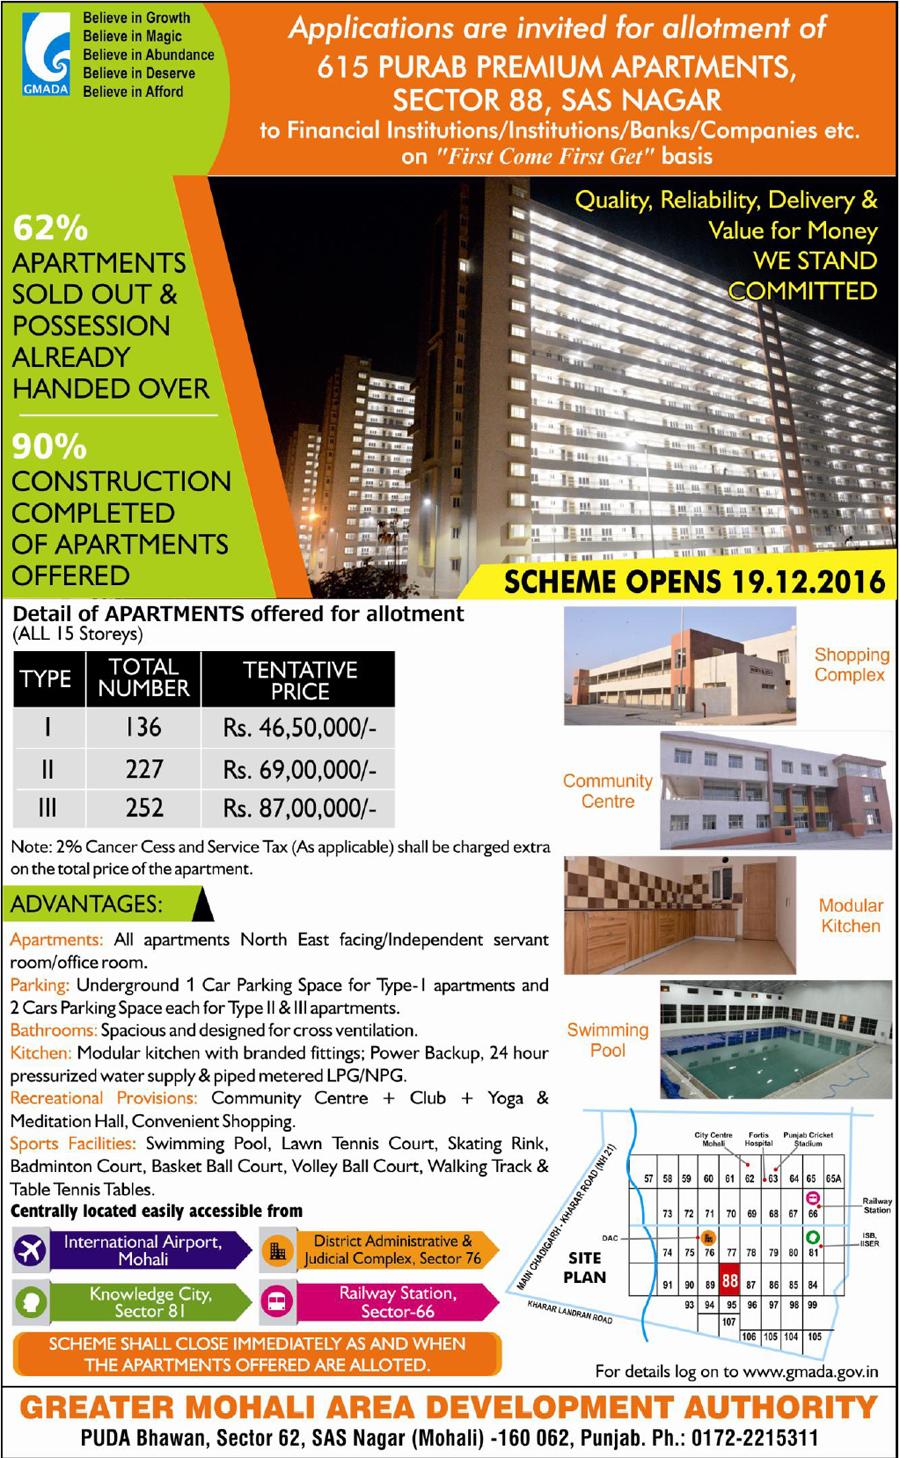 GMADA Purab Apartments Scheme 2016